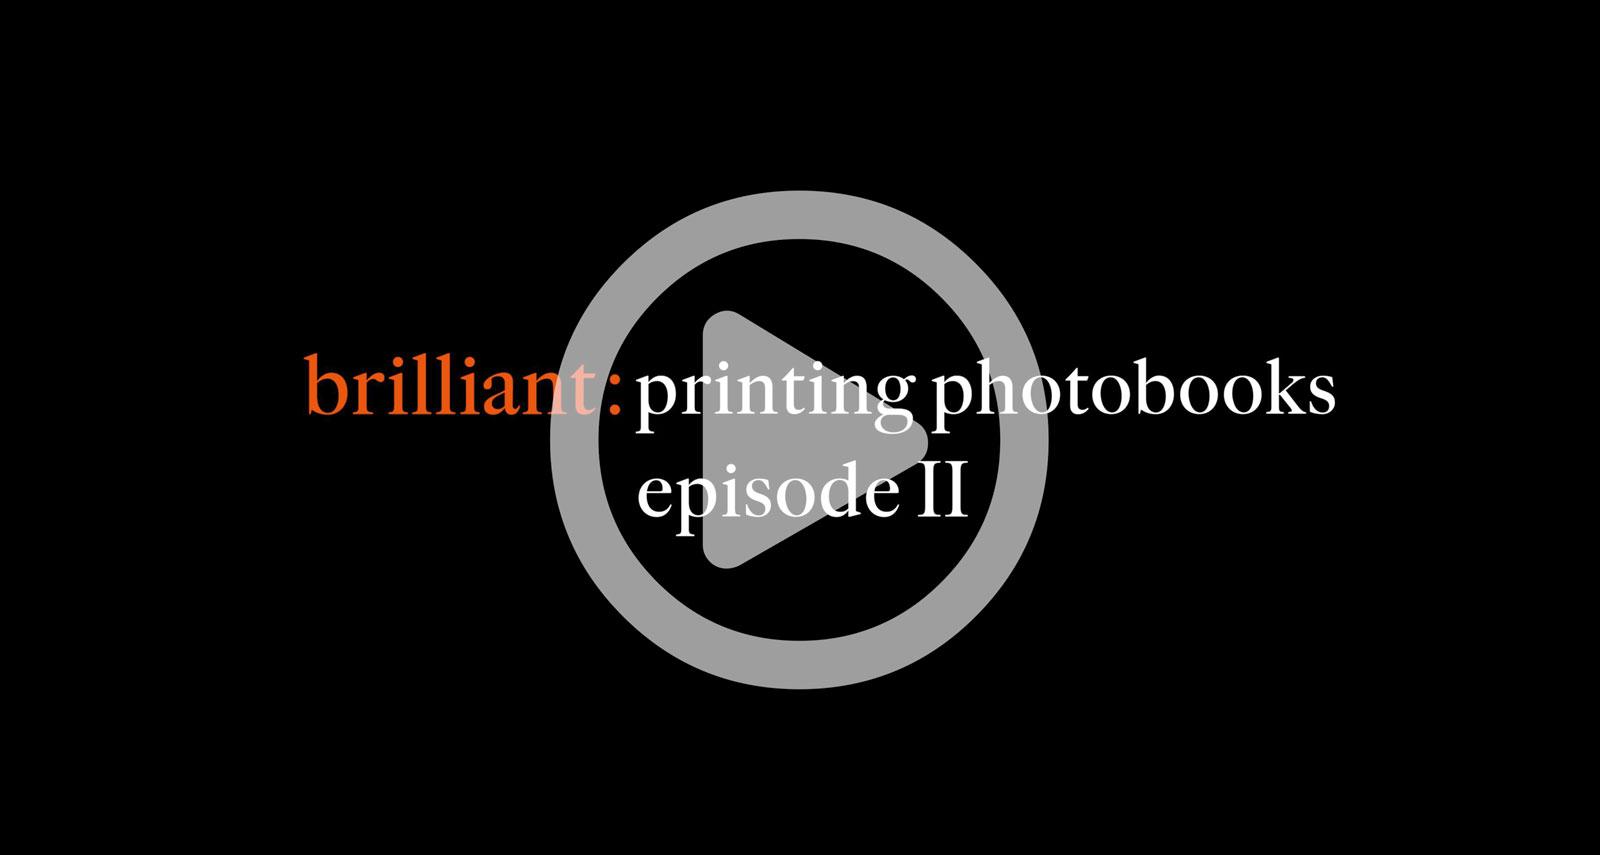 brilliant : printing photobooks episode II